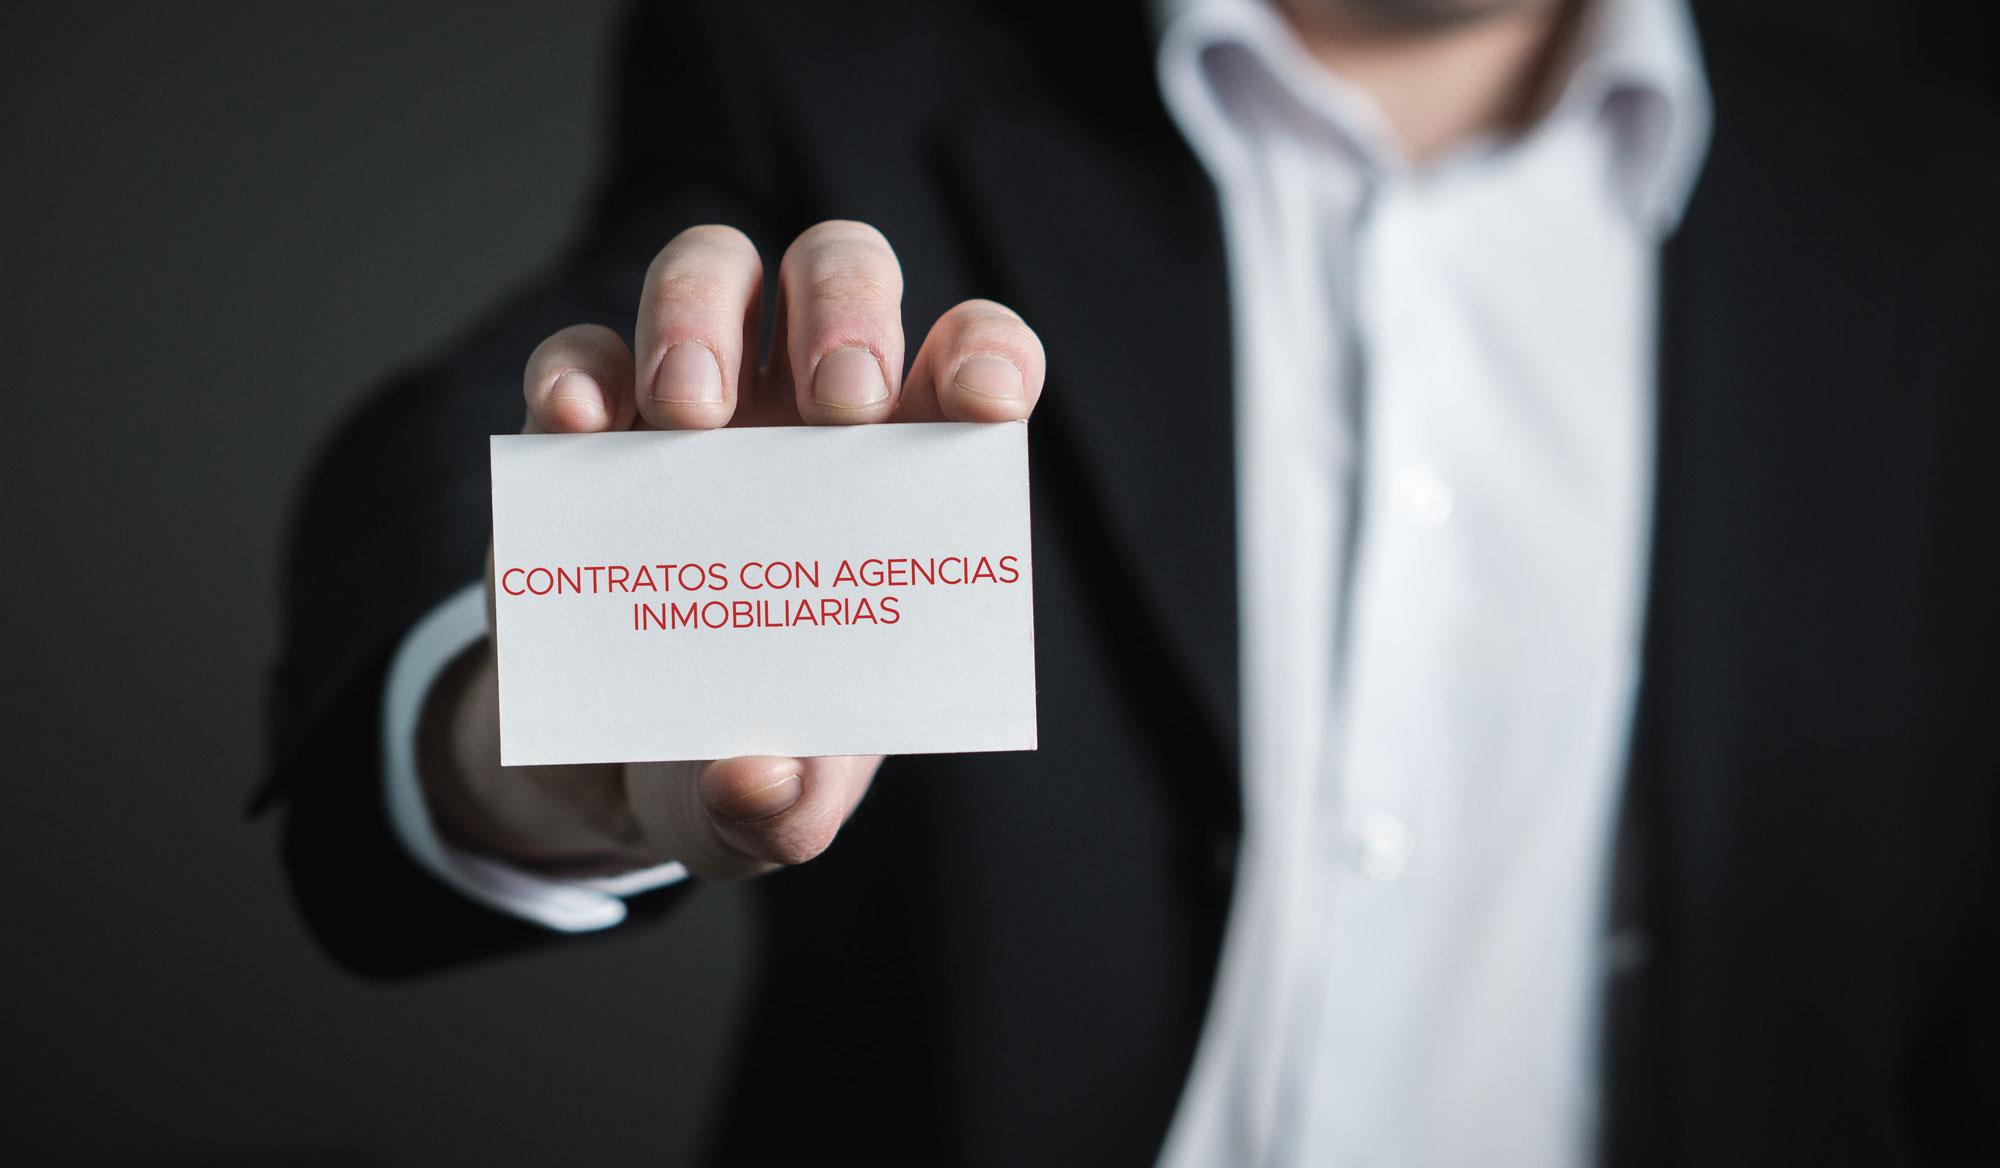 CONTRATOS CON AGENCIAS INMOBILIARIAS